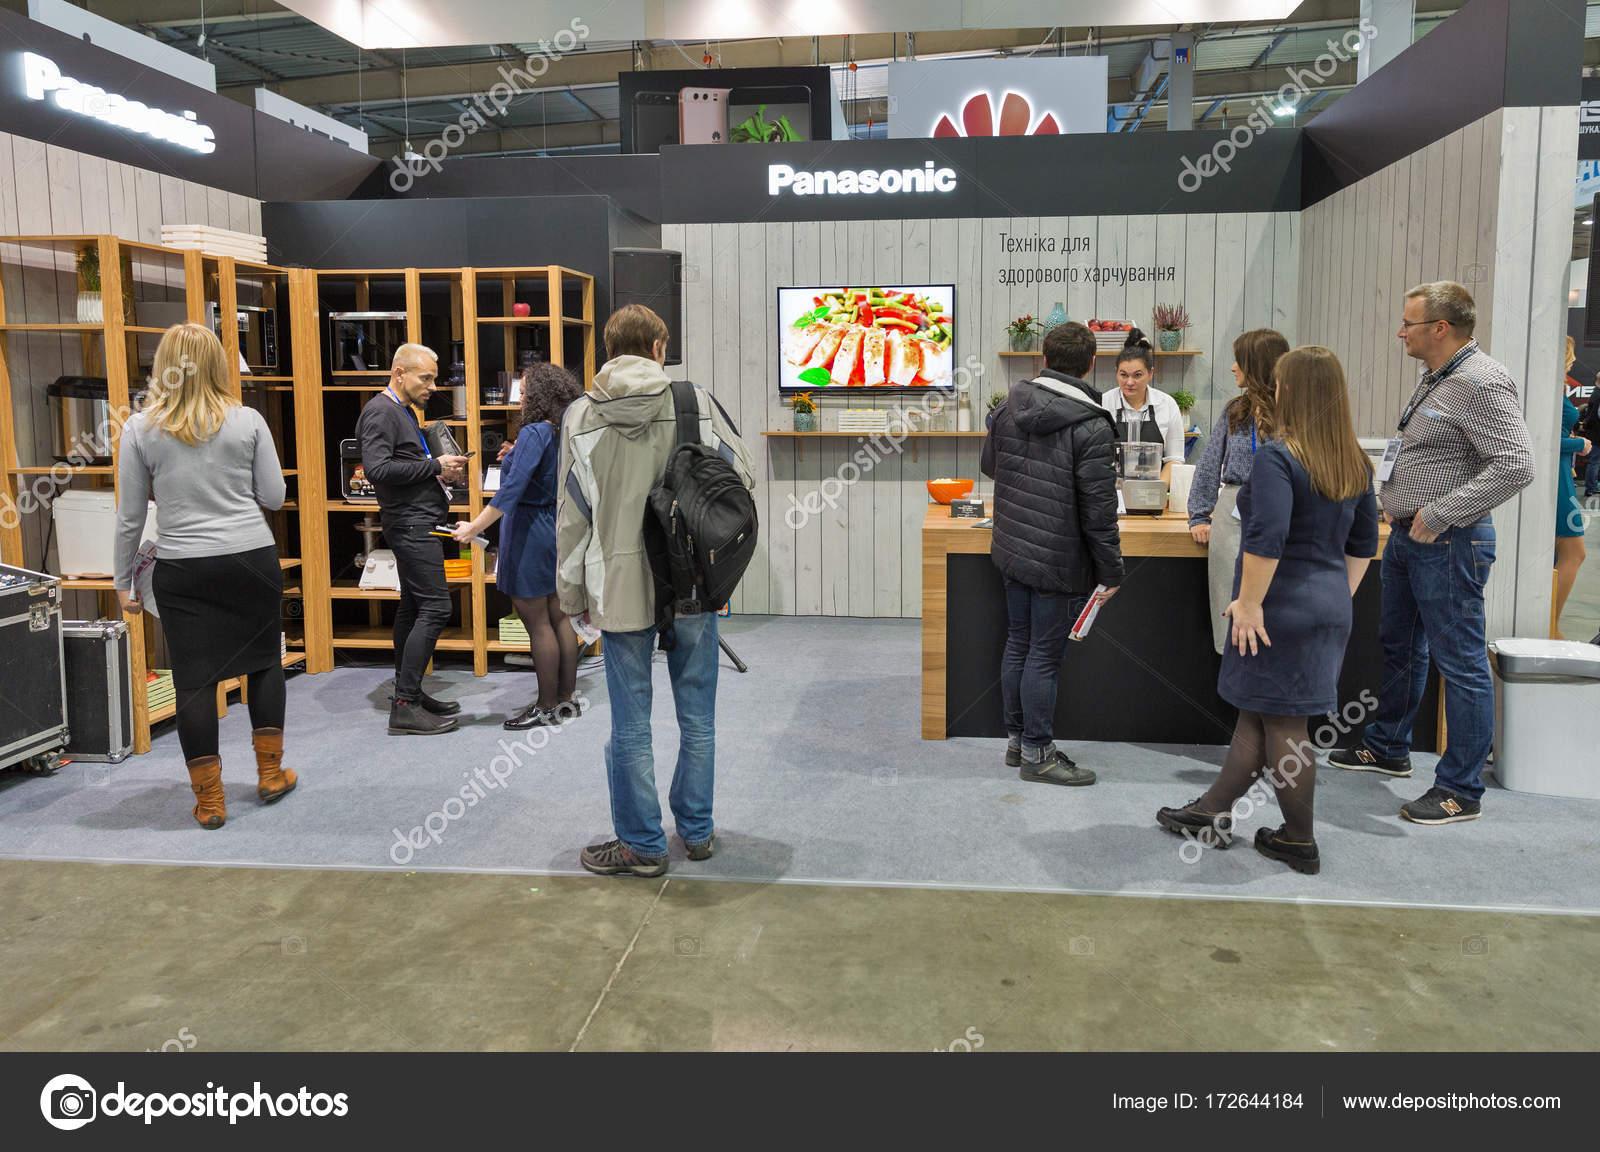 kitchen booths countertops 松下厨房用具摊位在中欧和东欧2017在基辅 乌克兰 图库社论照片 图库照片